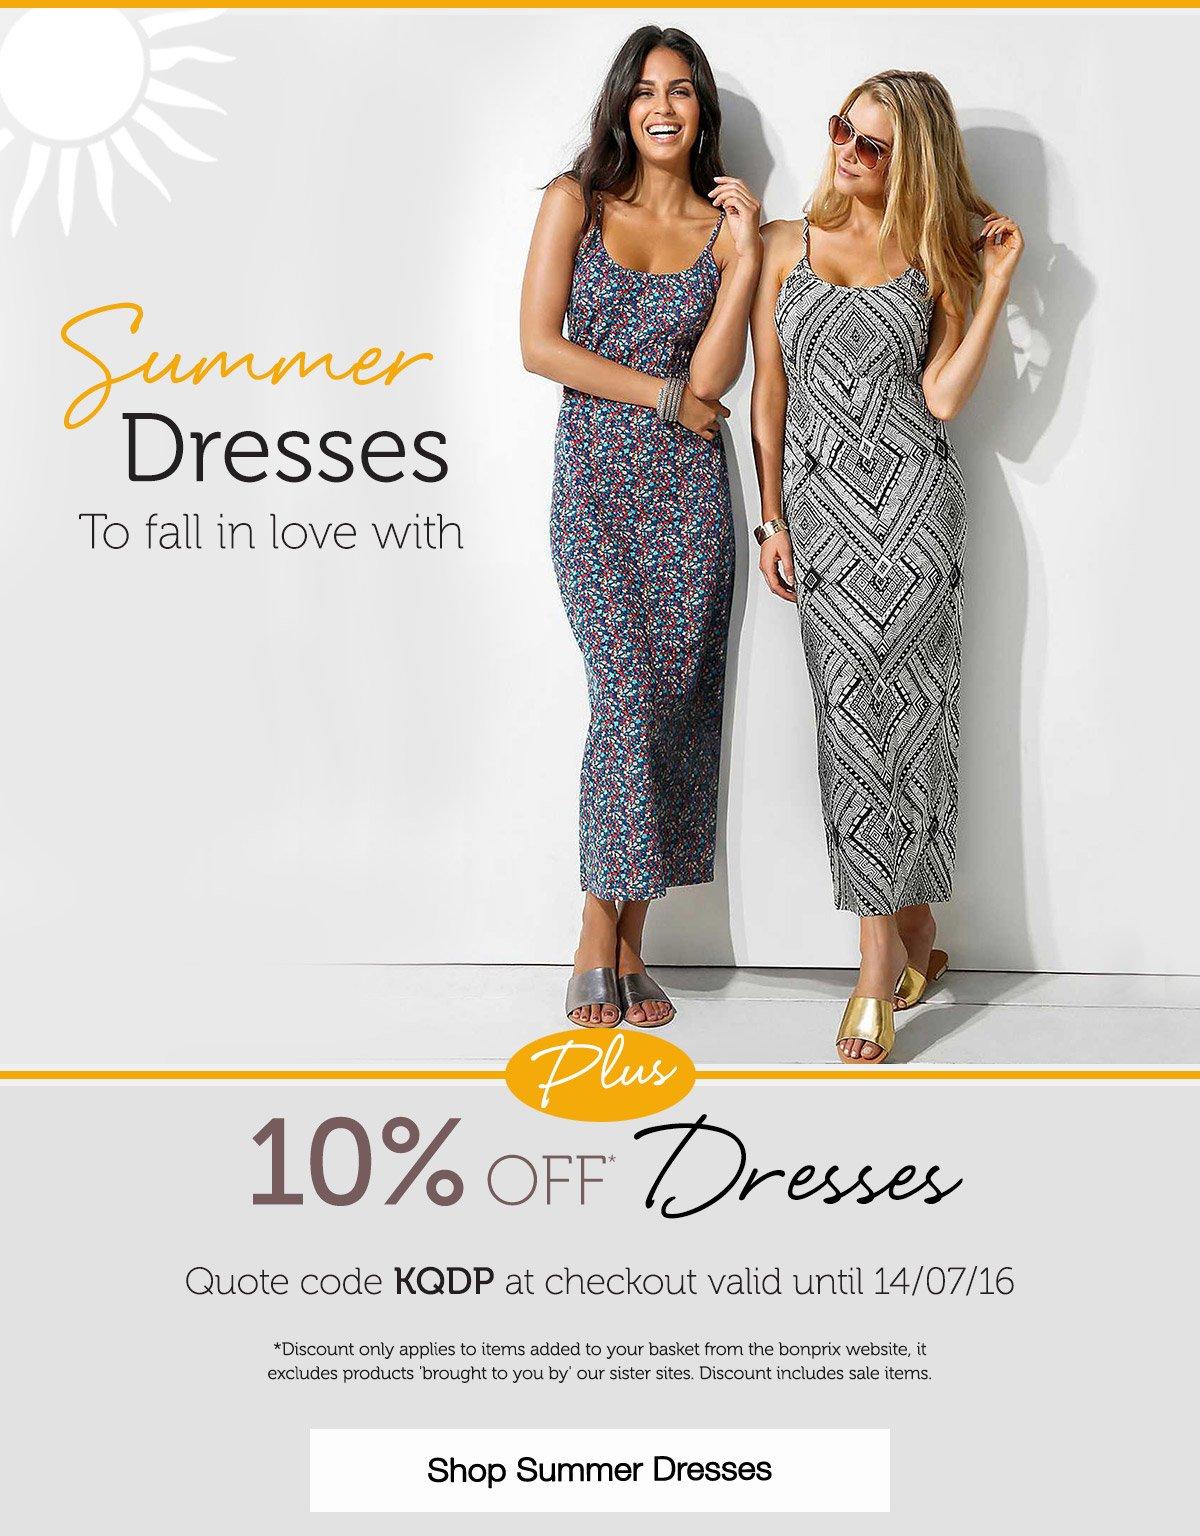 dd67b307659d Bonprix UK  Summer Lovin  Dresses + 10% OFF!